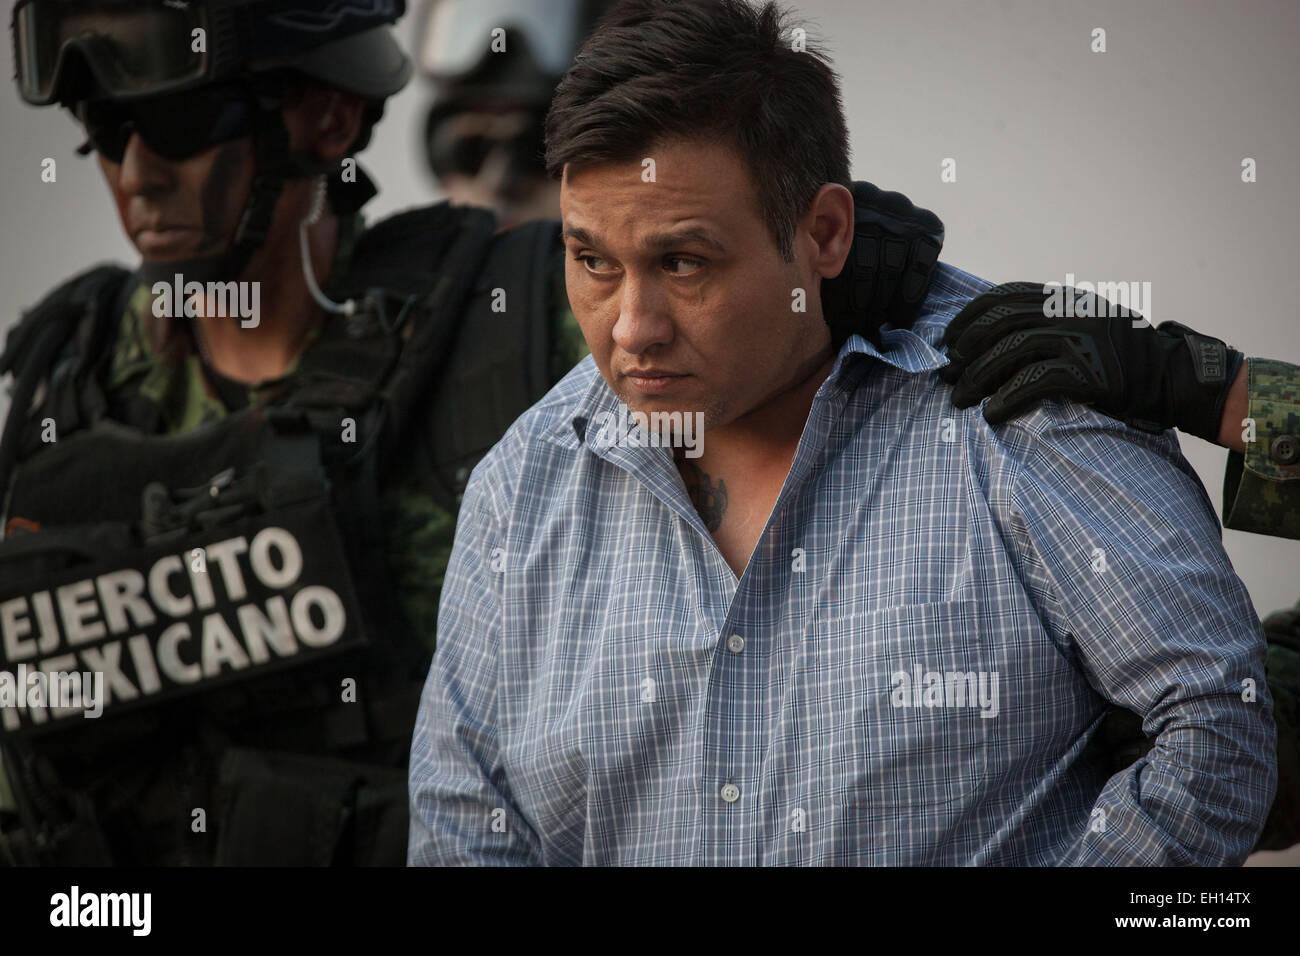 Escort in mexico city